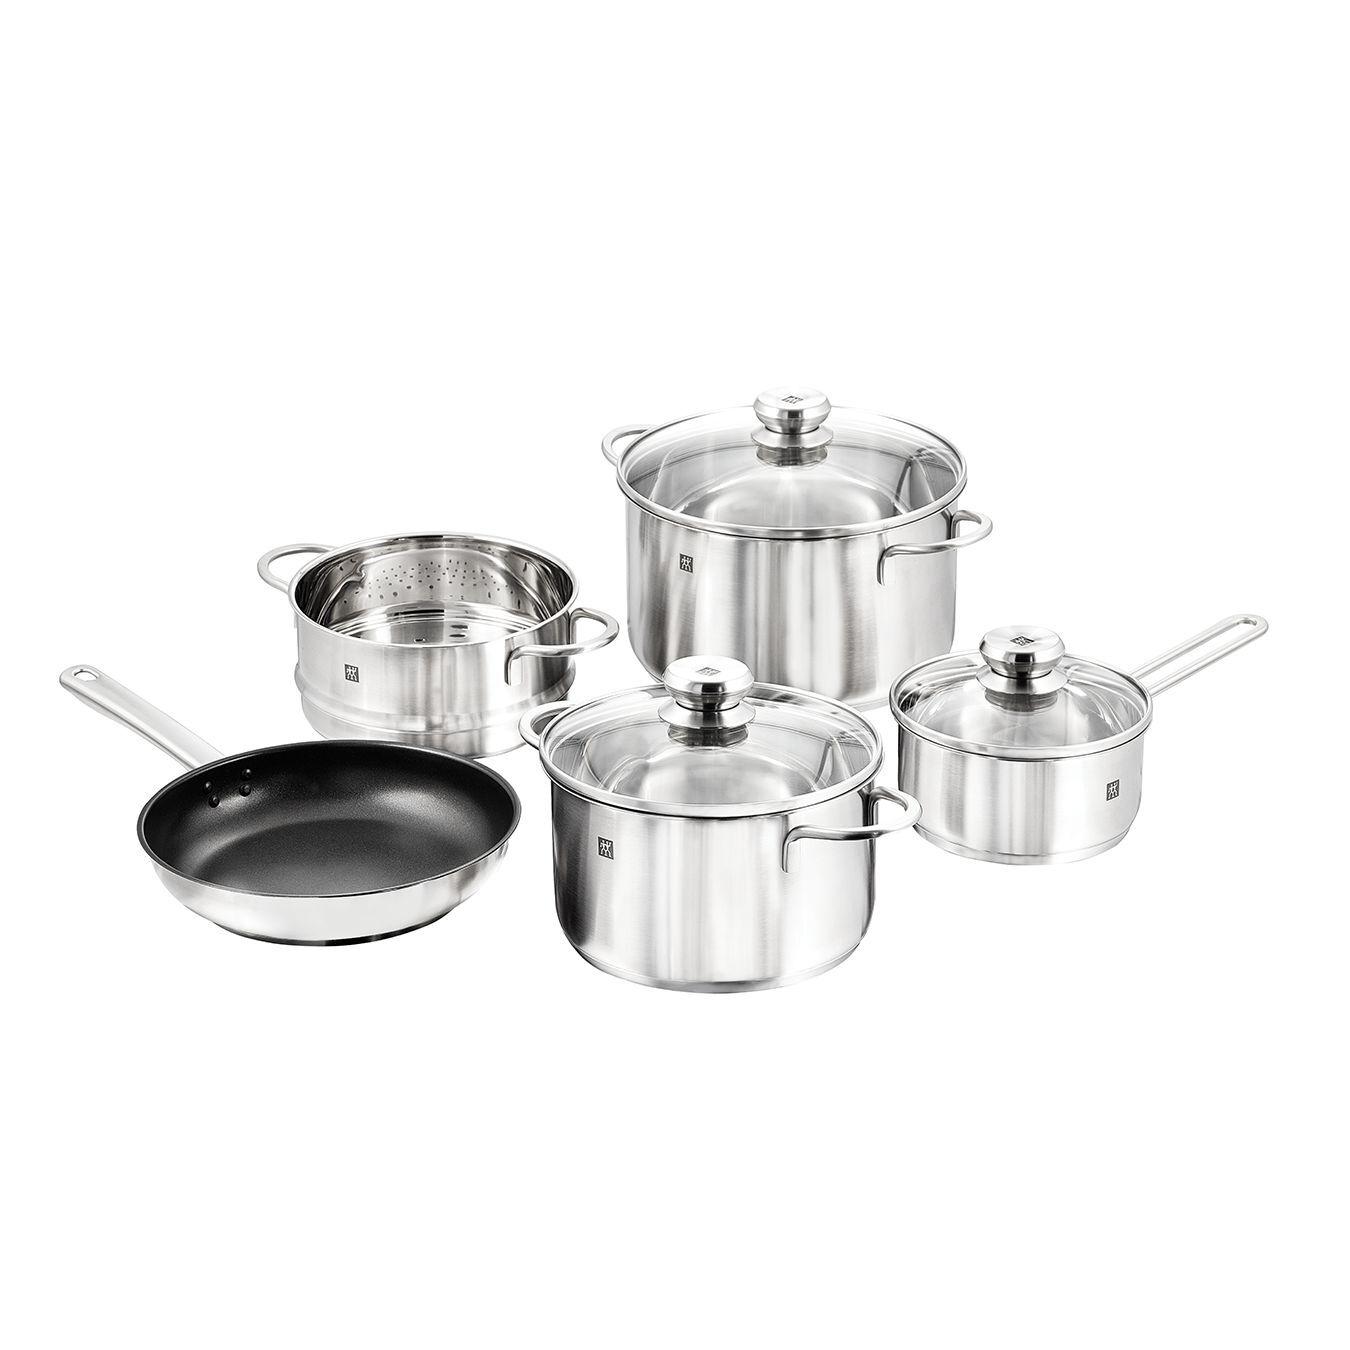 8 Piece Cookware set,,large 1